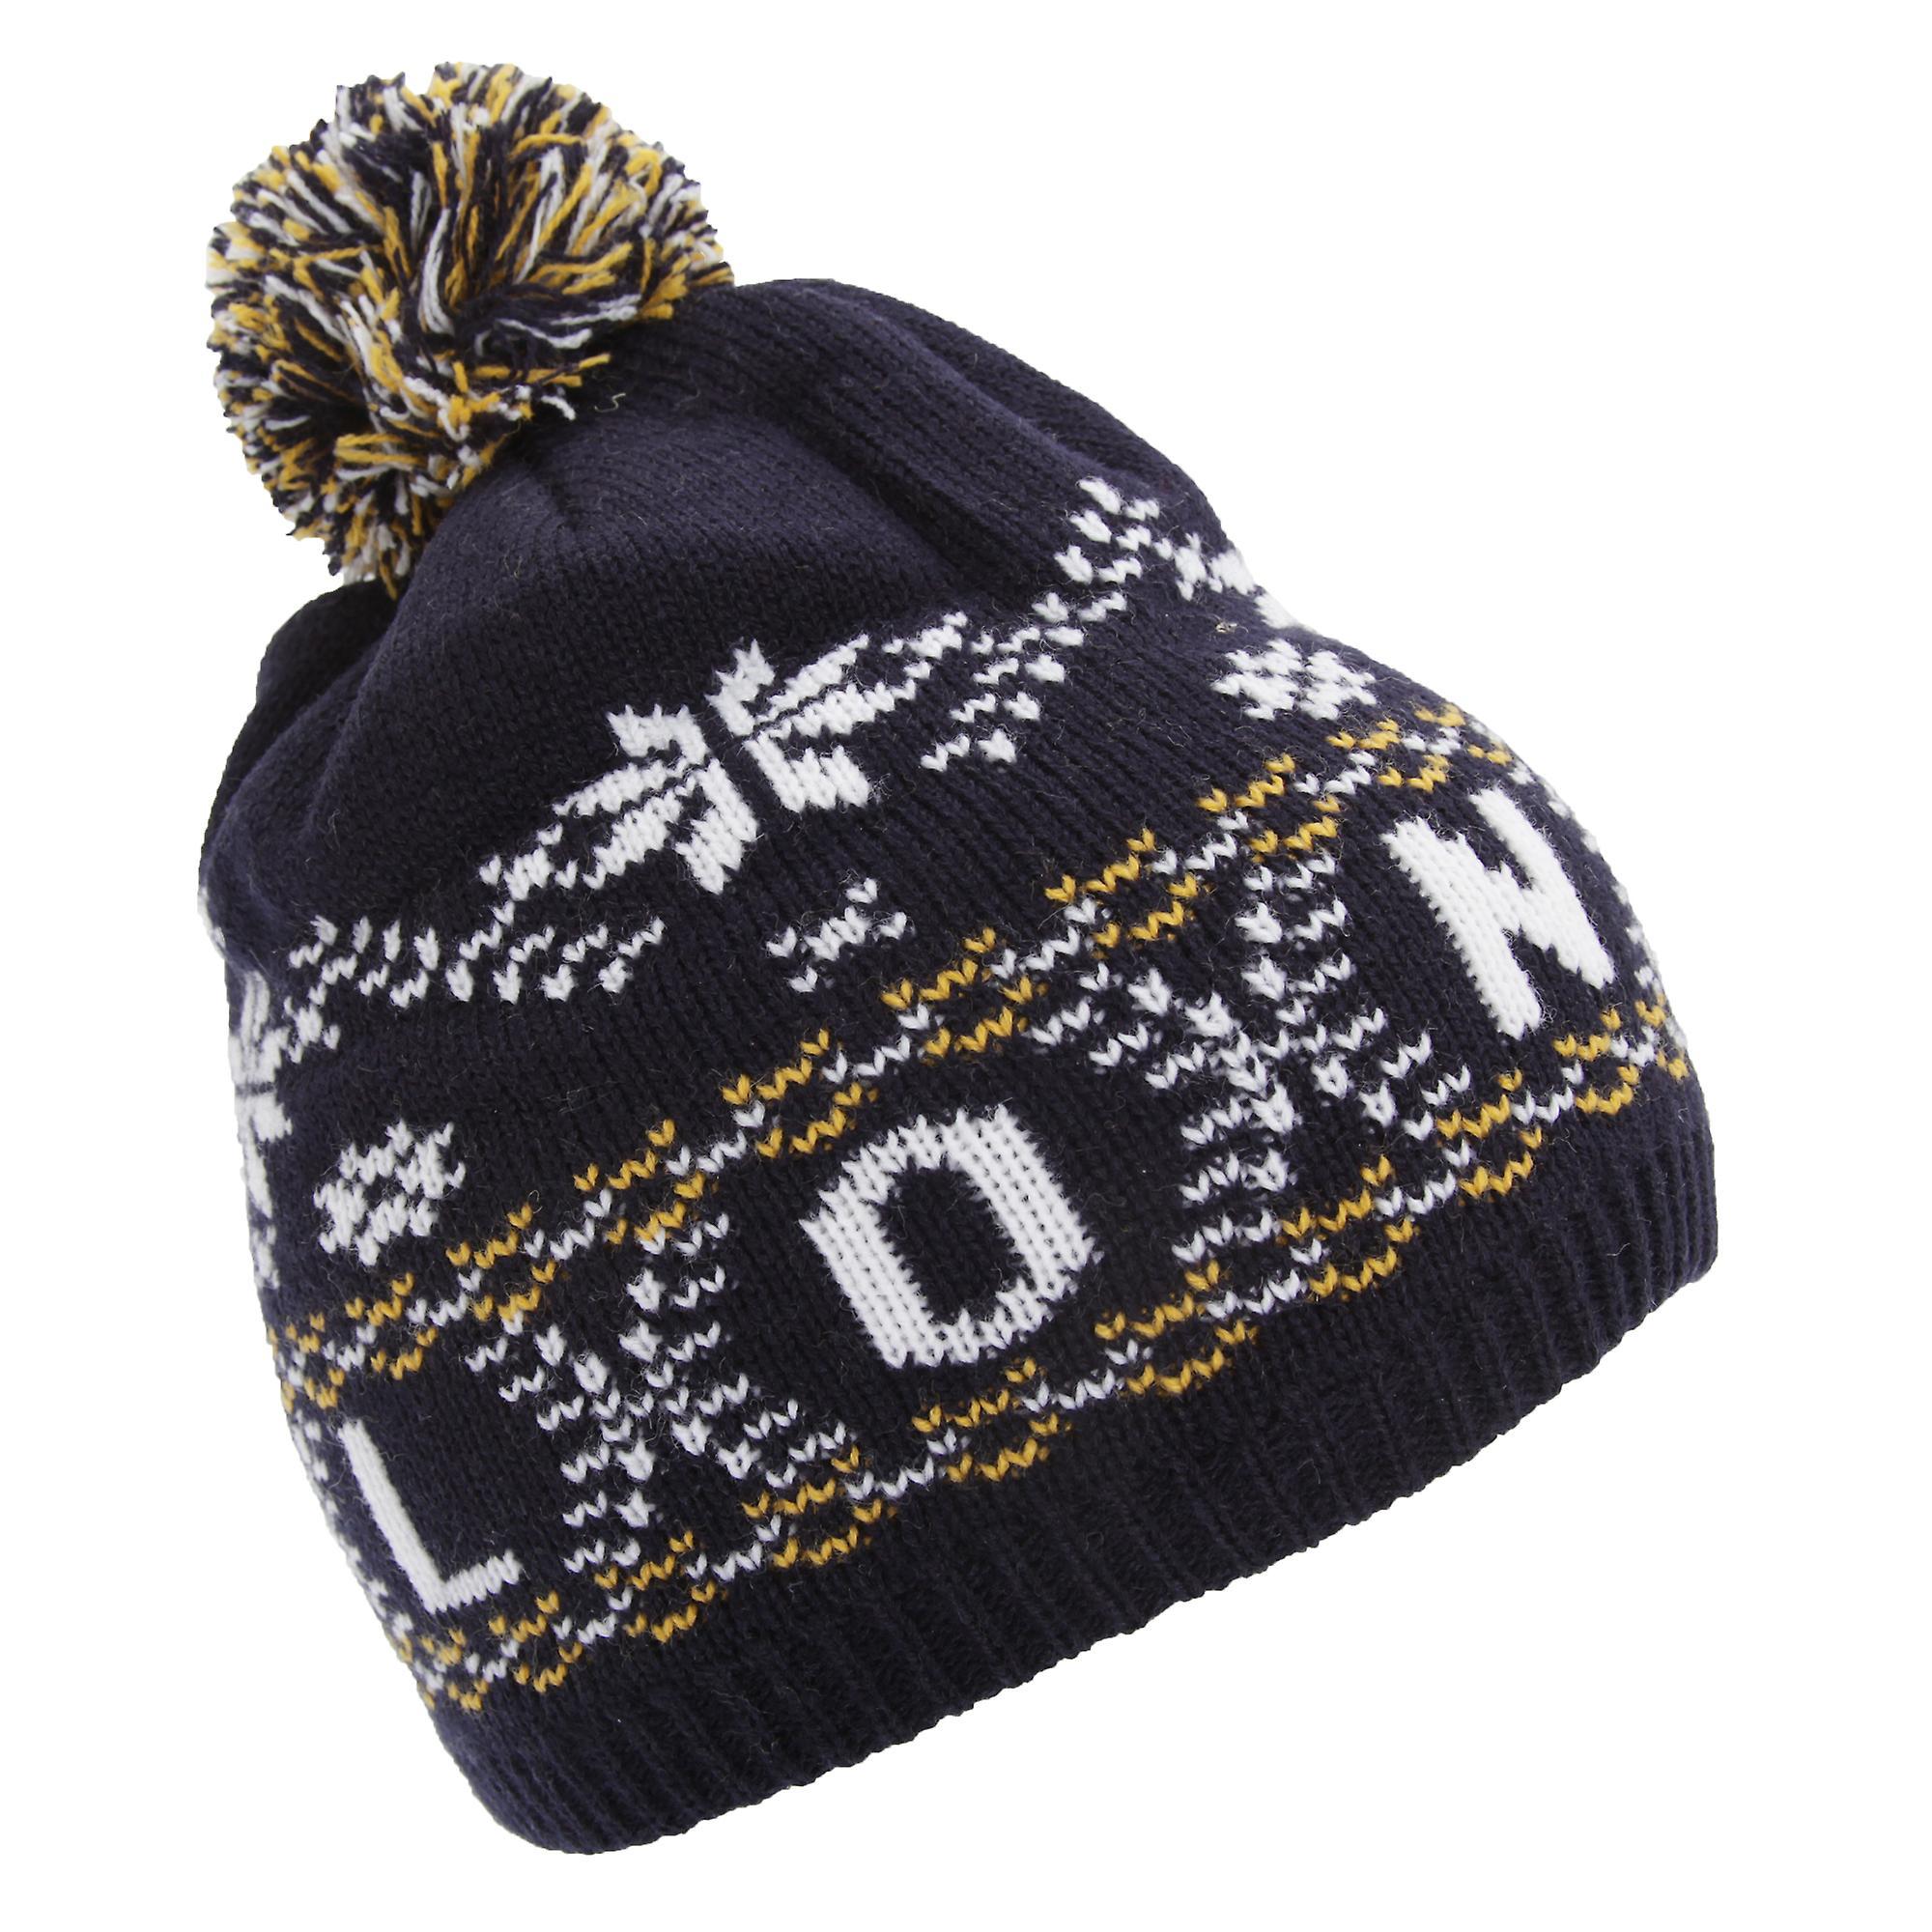 Childrens/Kids Fairisle Pattern London Winter Bobble Hat